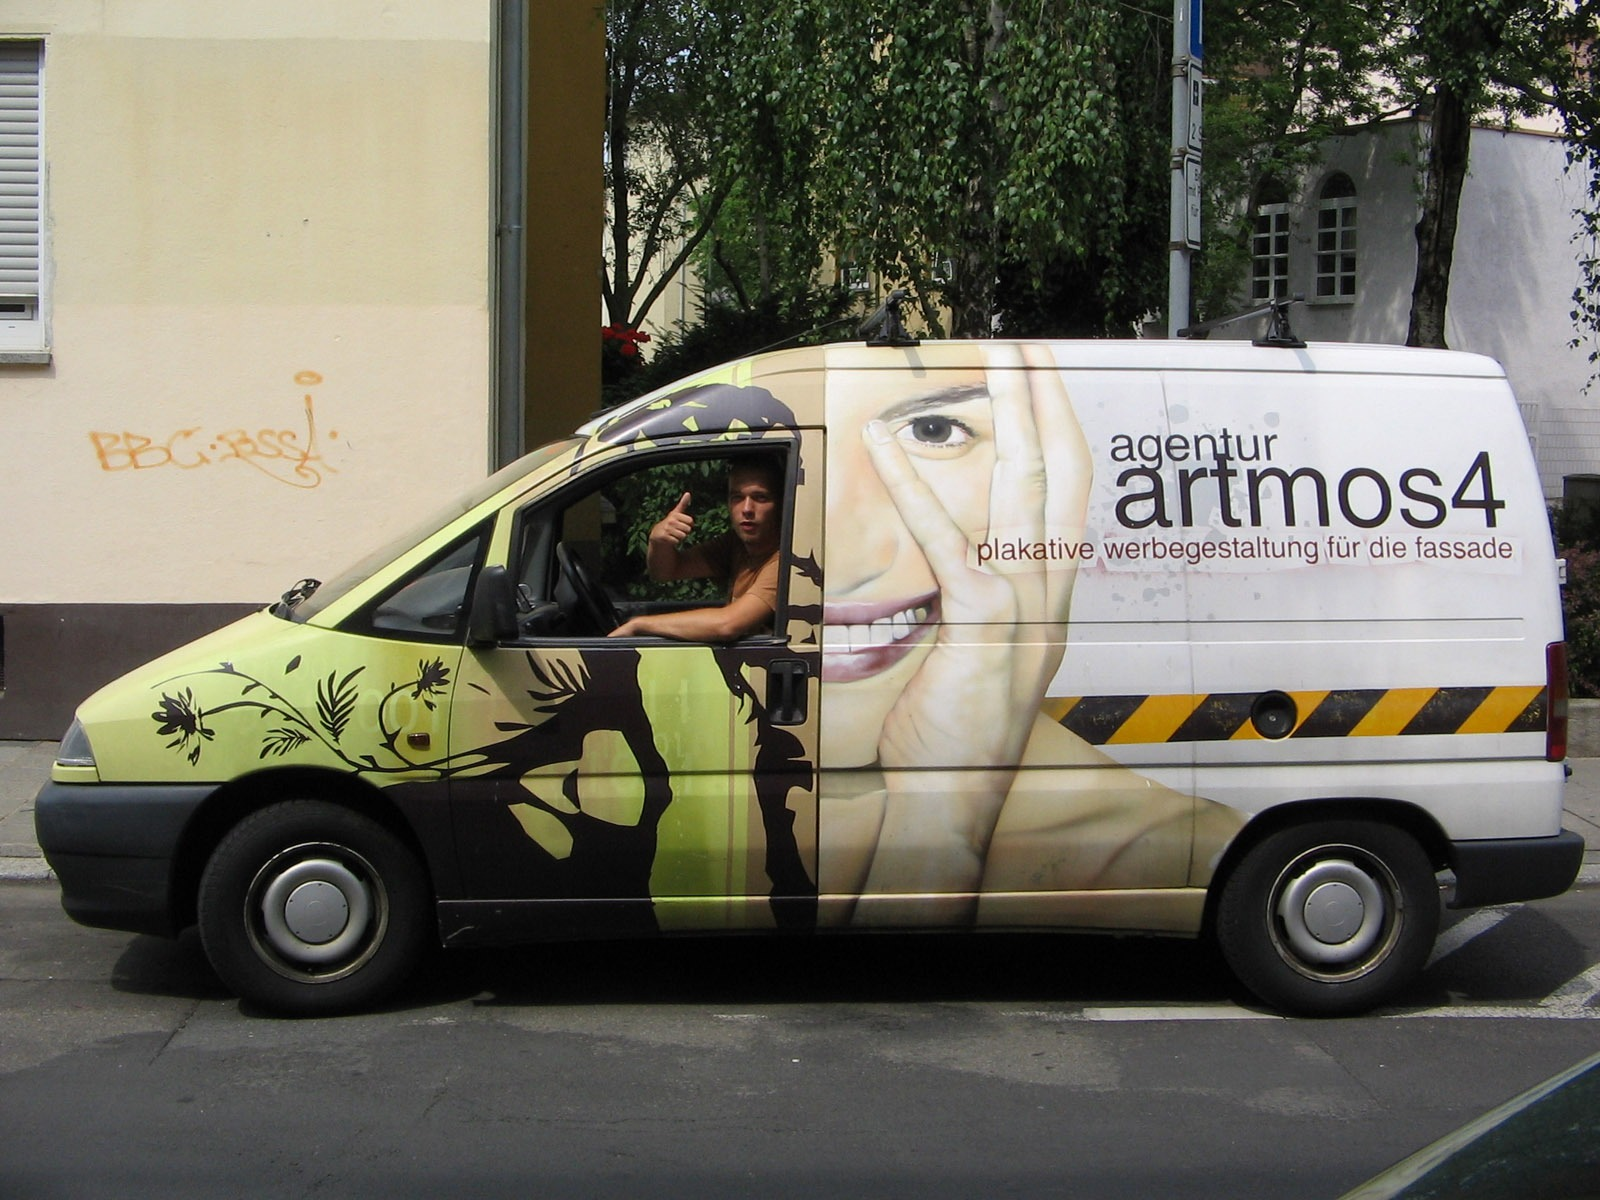 graffitiauftrag-graffitikuenstler-artmos4-fahrzeug-2009-gesicht-mensch-pflanzen-logo-schrift-grafisch-objekt-folie-fotorealistisch